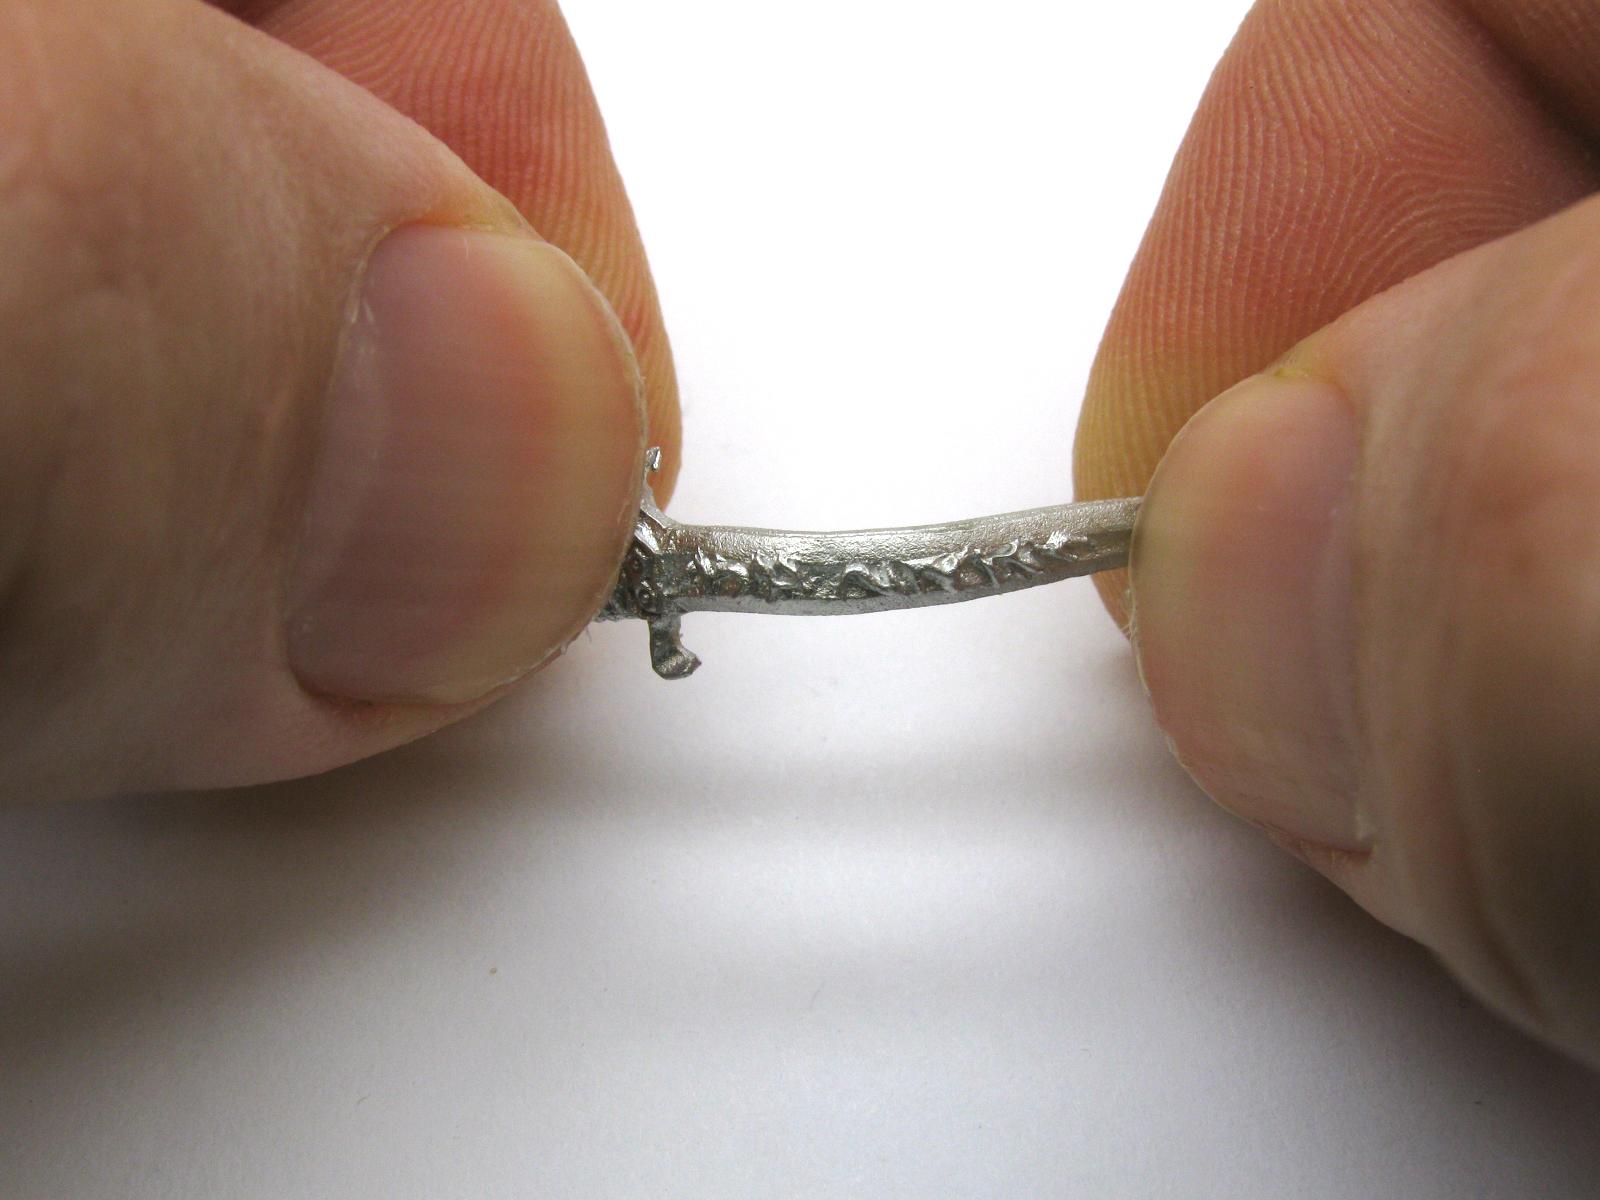 Fix Reaper Miniature's bent weapon